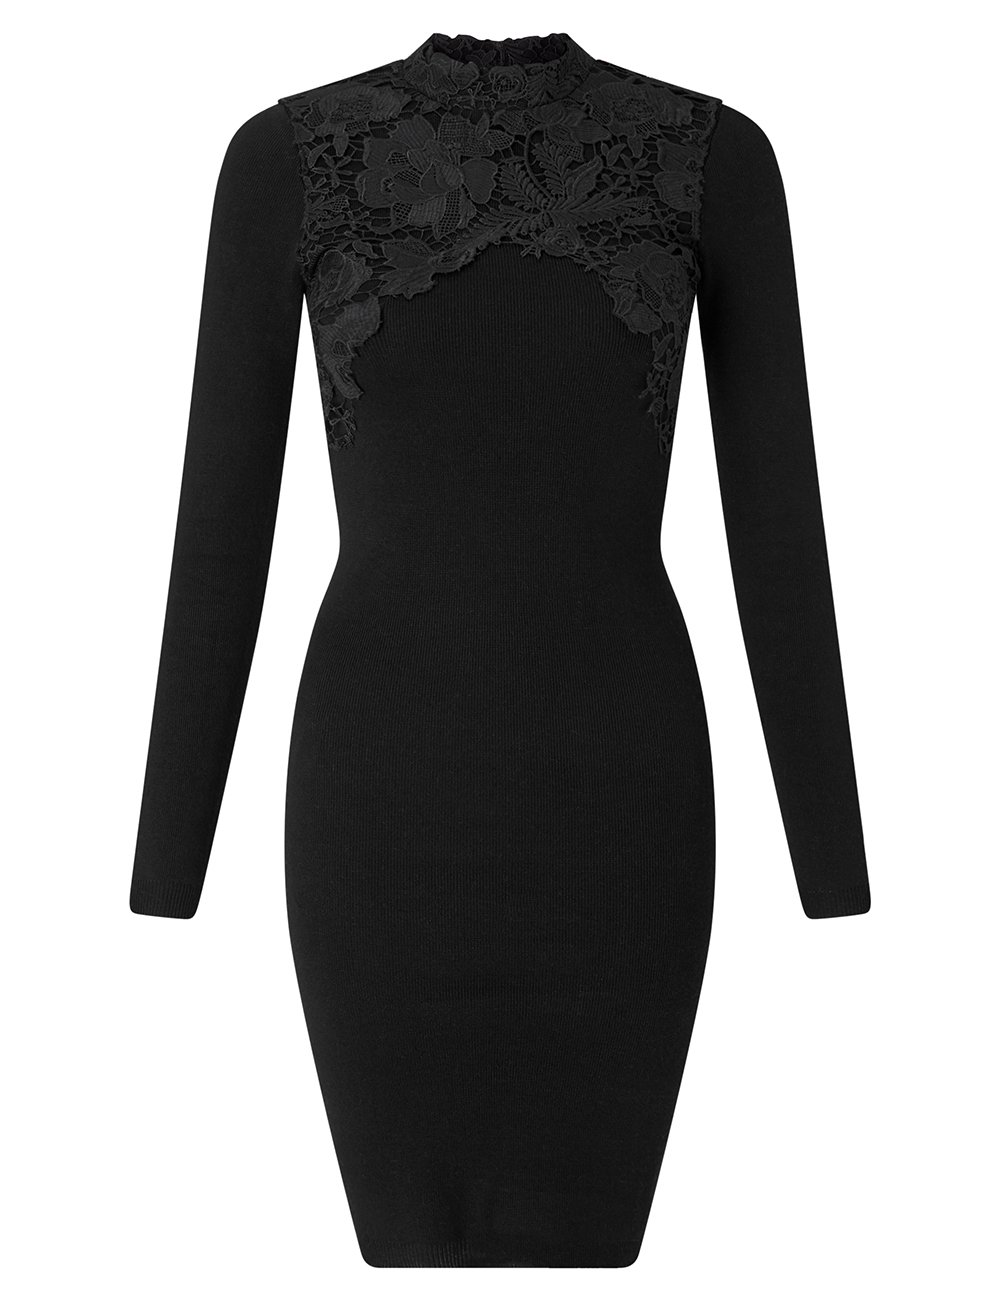 LIPSY Womens Lace Appliquà Dress Black US 10 (UK 14) by LIPSY (Image #2)